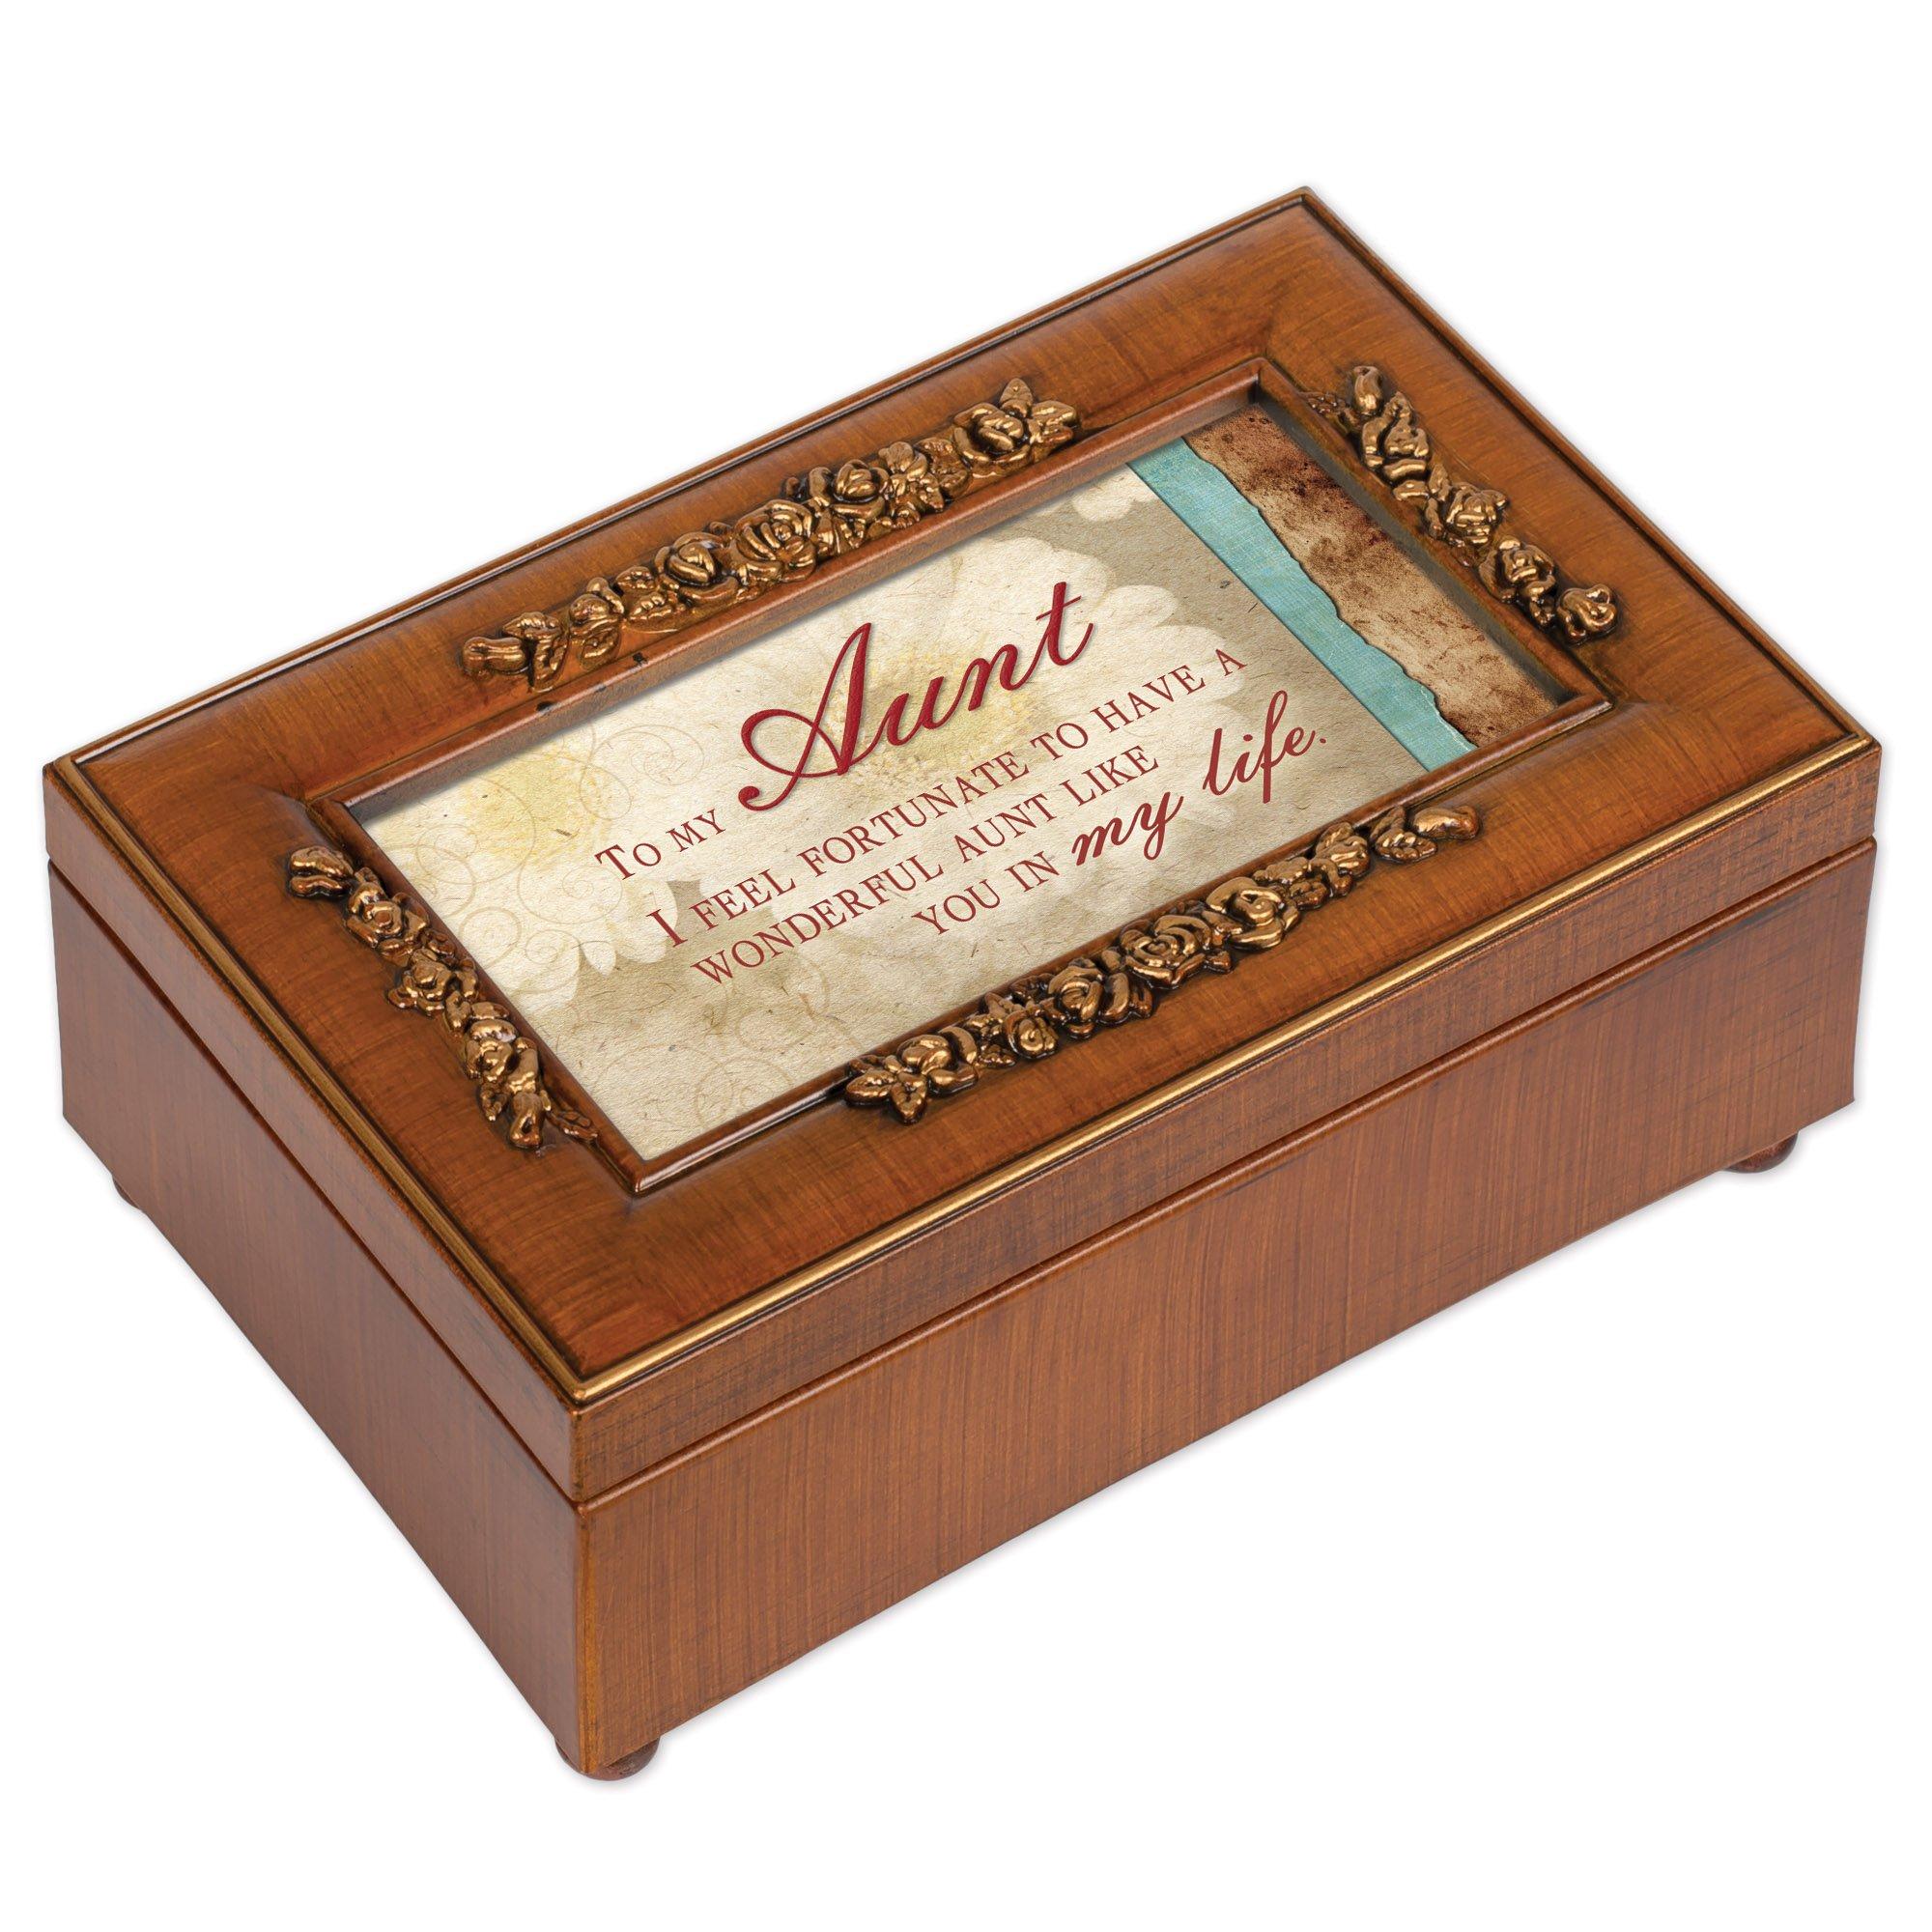 Aunt Rich Walnut Finish Petite Jewelry Music Box - Plays Wonderful World